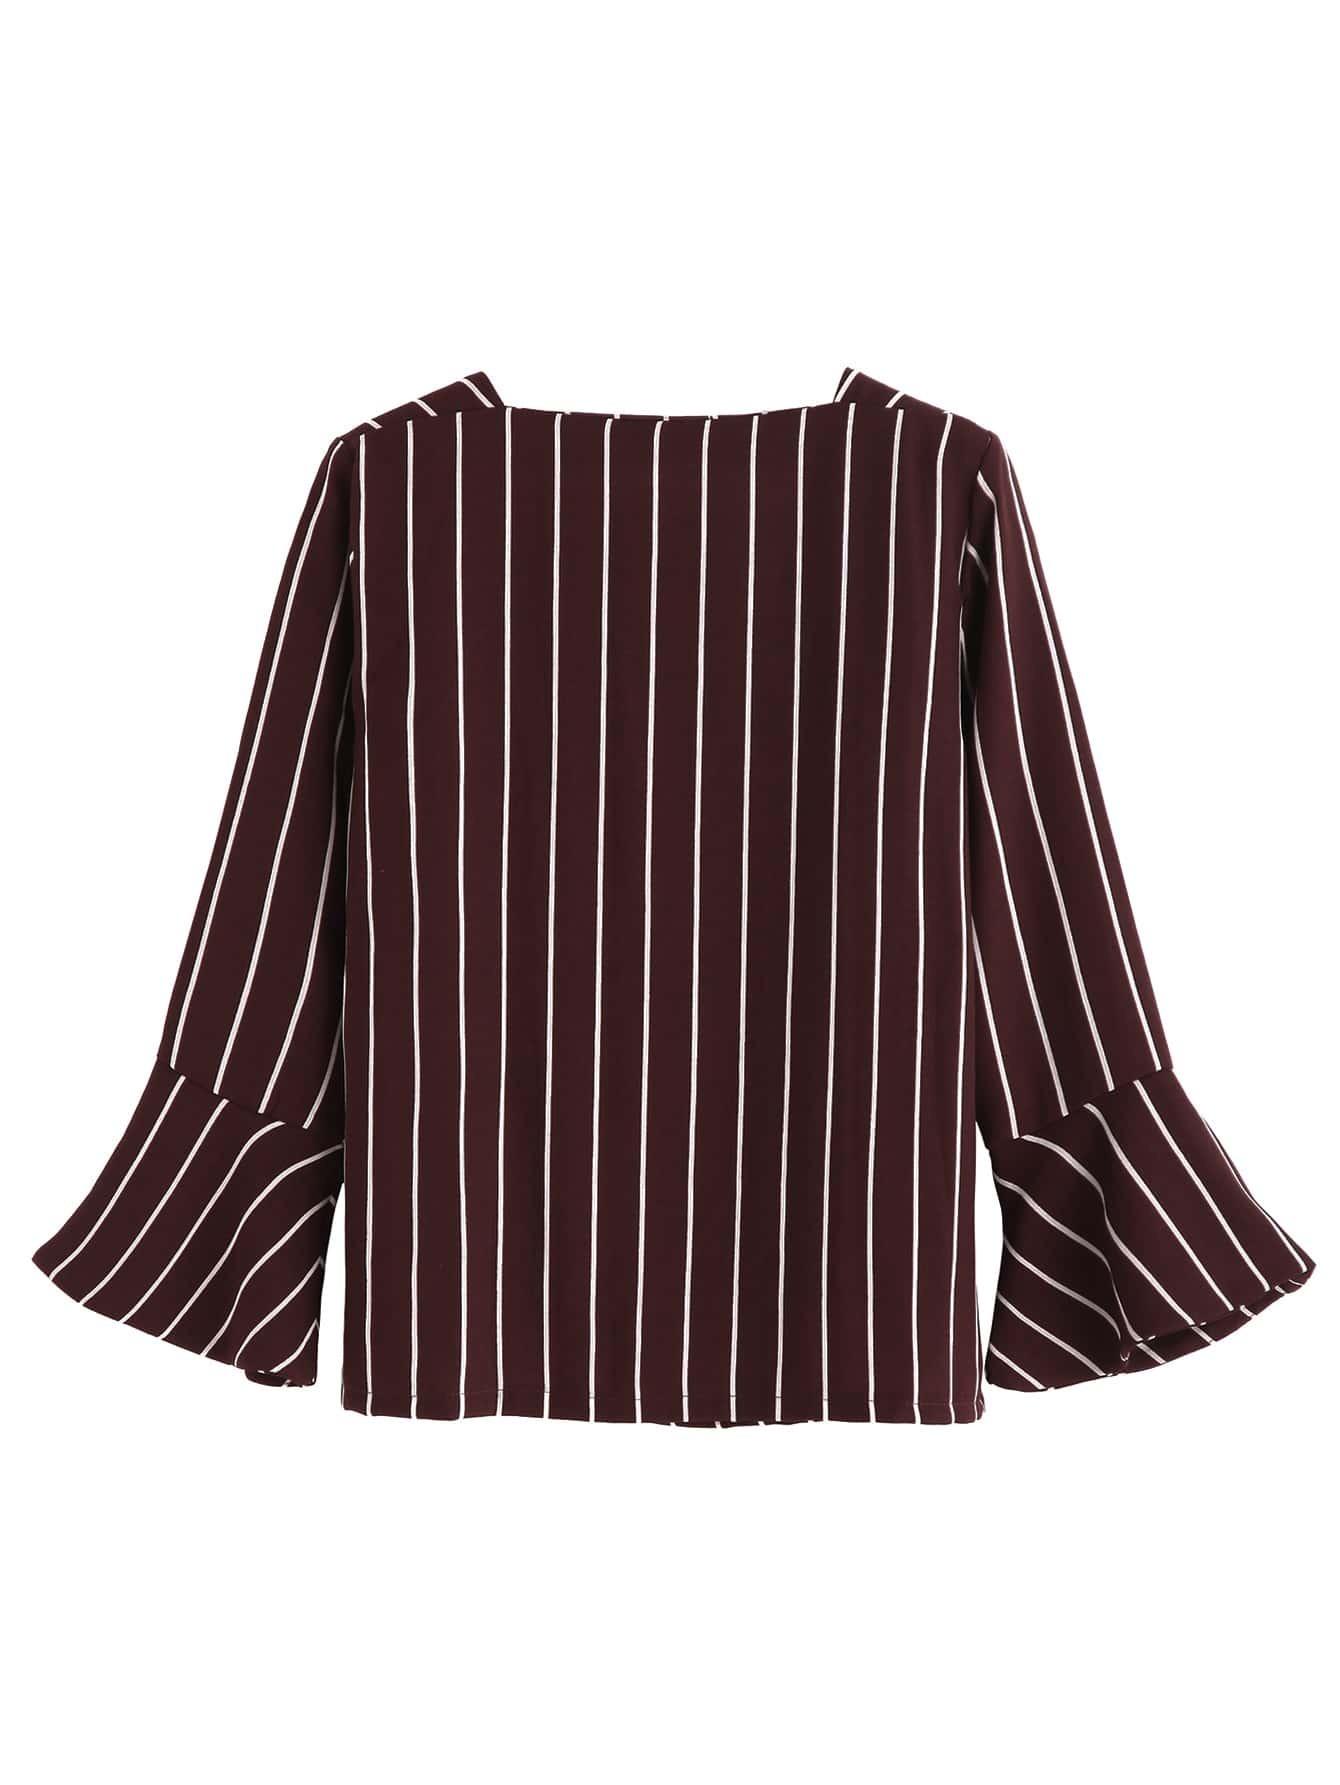 blouse160829004_2